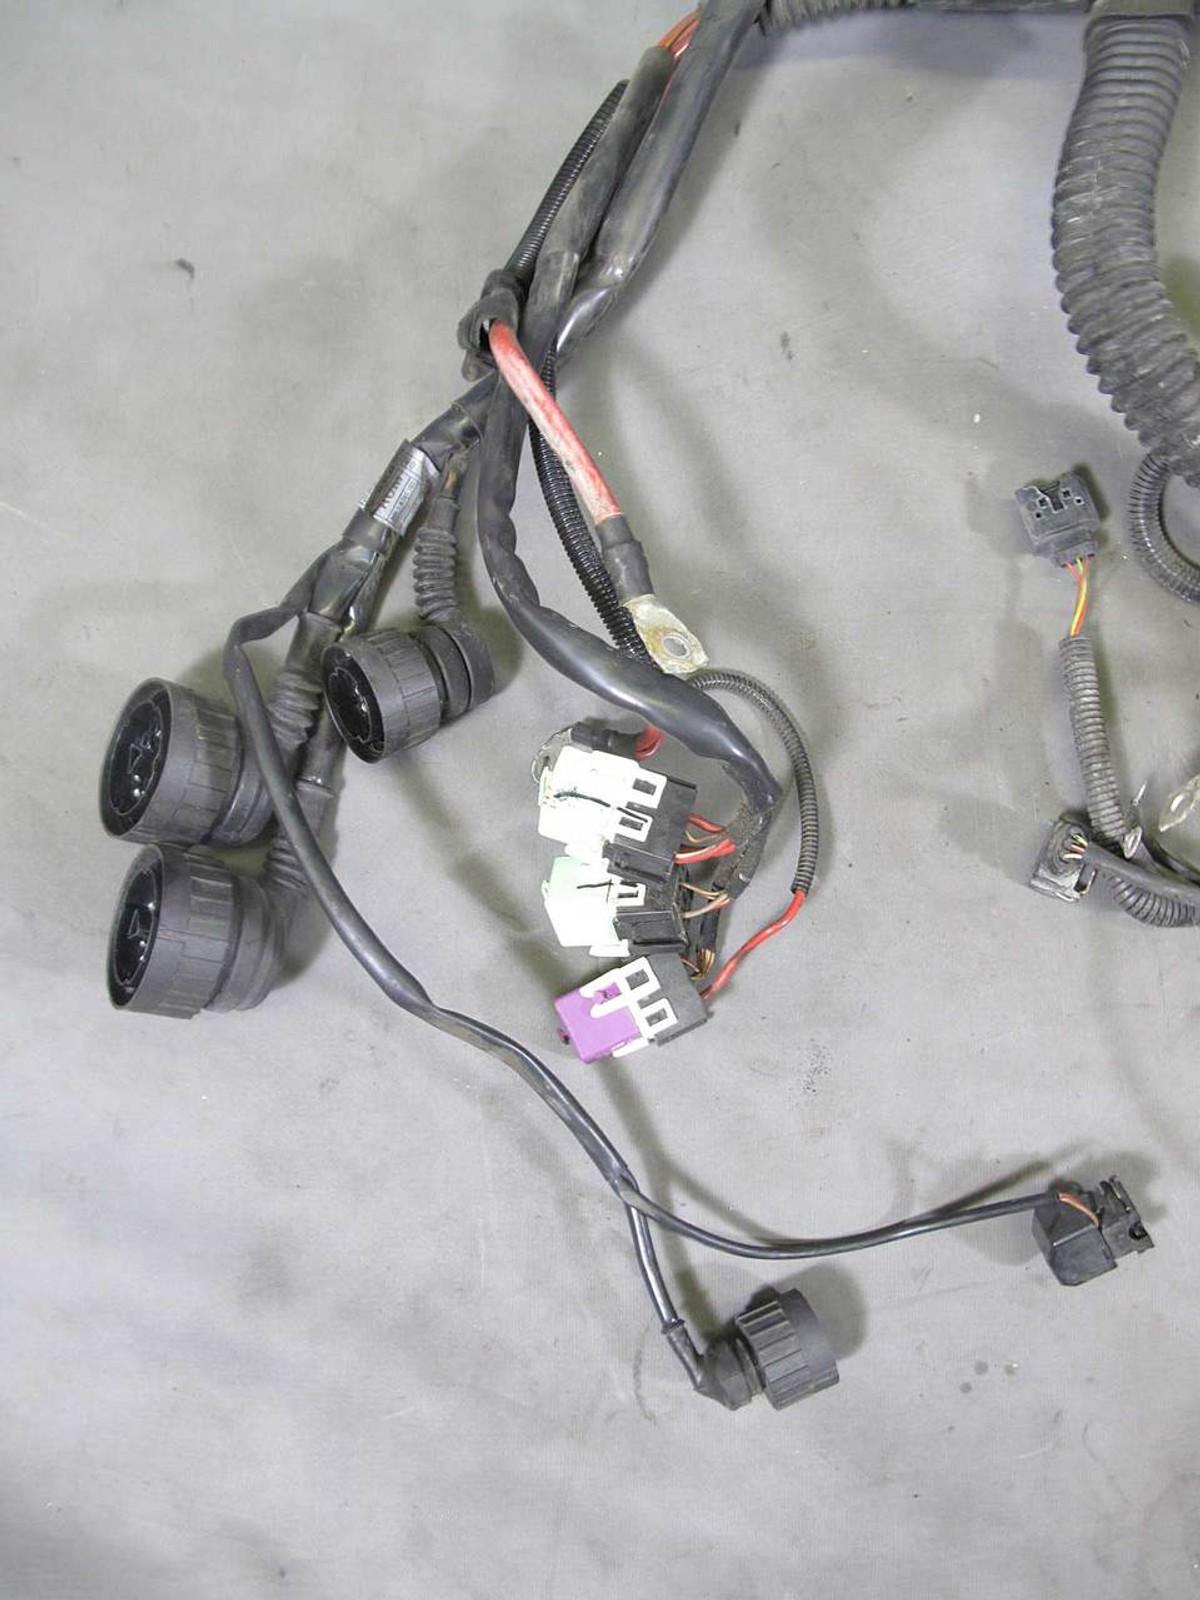 wire harness cover m3 wiring diagram view e30 m3 wiring harness cover wire harness cover m3 [ 1200 x 1600 Pixel ]